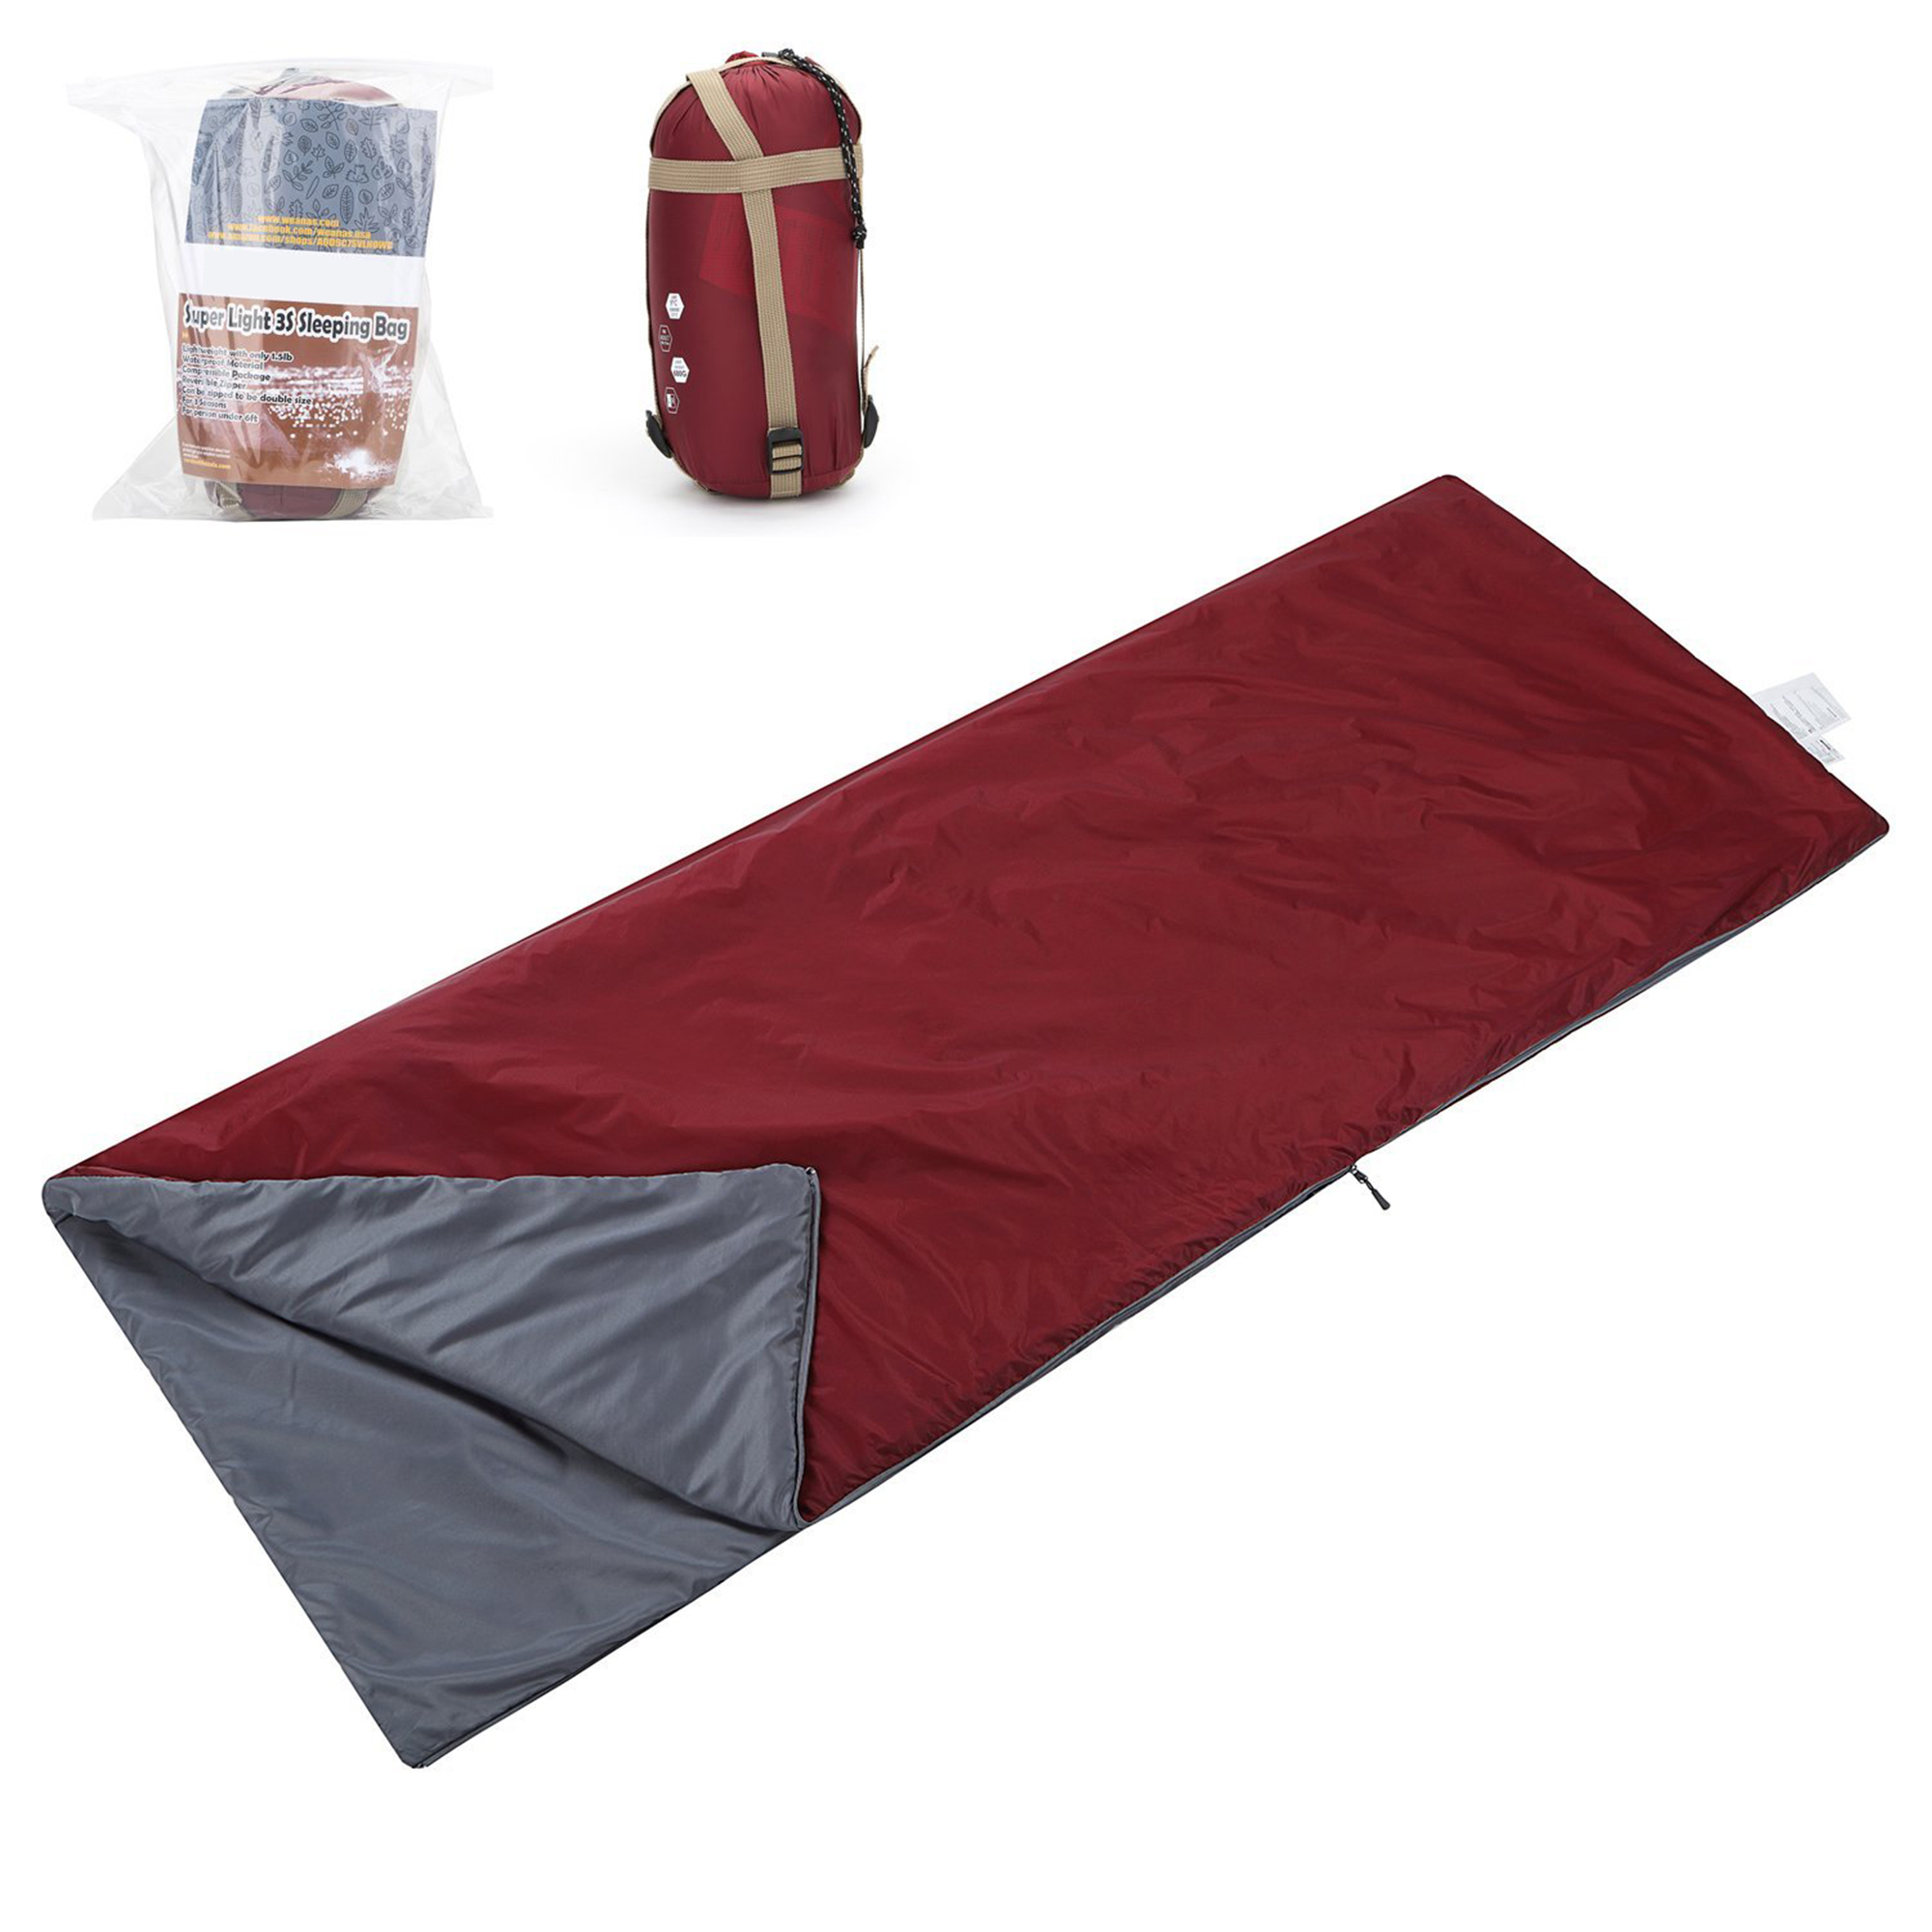 SehrGo Lightweight Compact Outdoor Camping Envelope Sleeping Bag Comfortable Waterproof for Summer School Hiking... by SehrGo